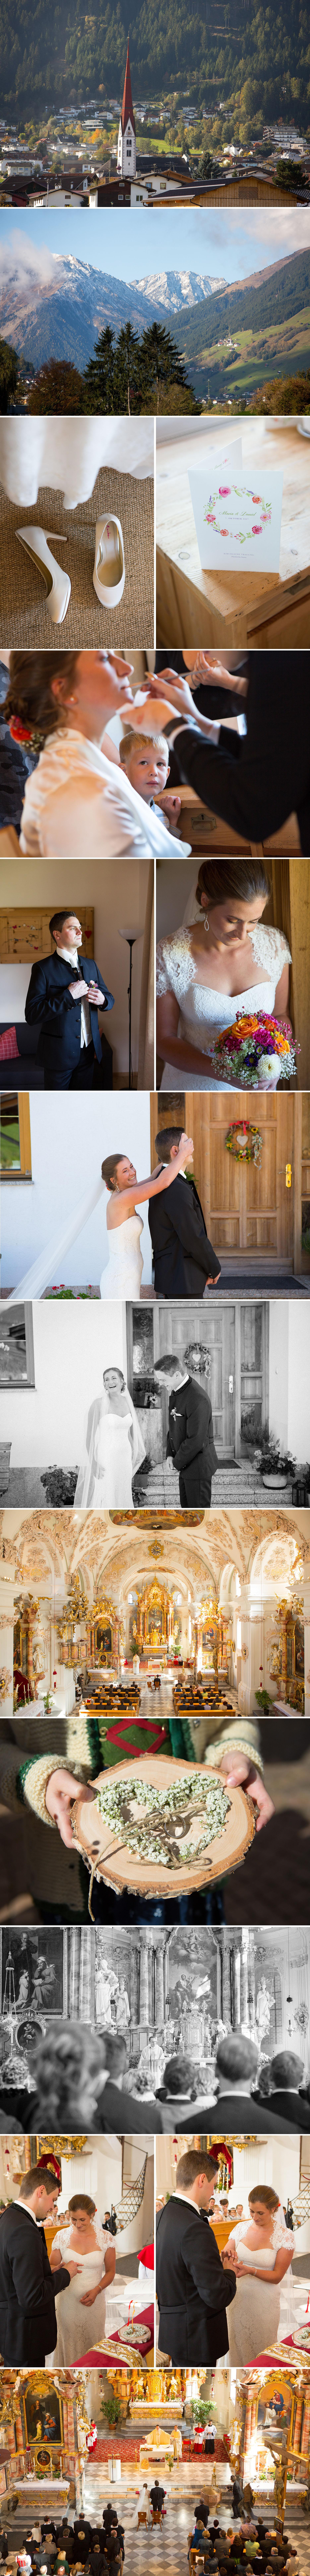 Wedding Photographer Tirol, Photographer Wedding Tirol